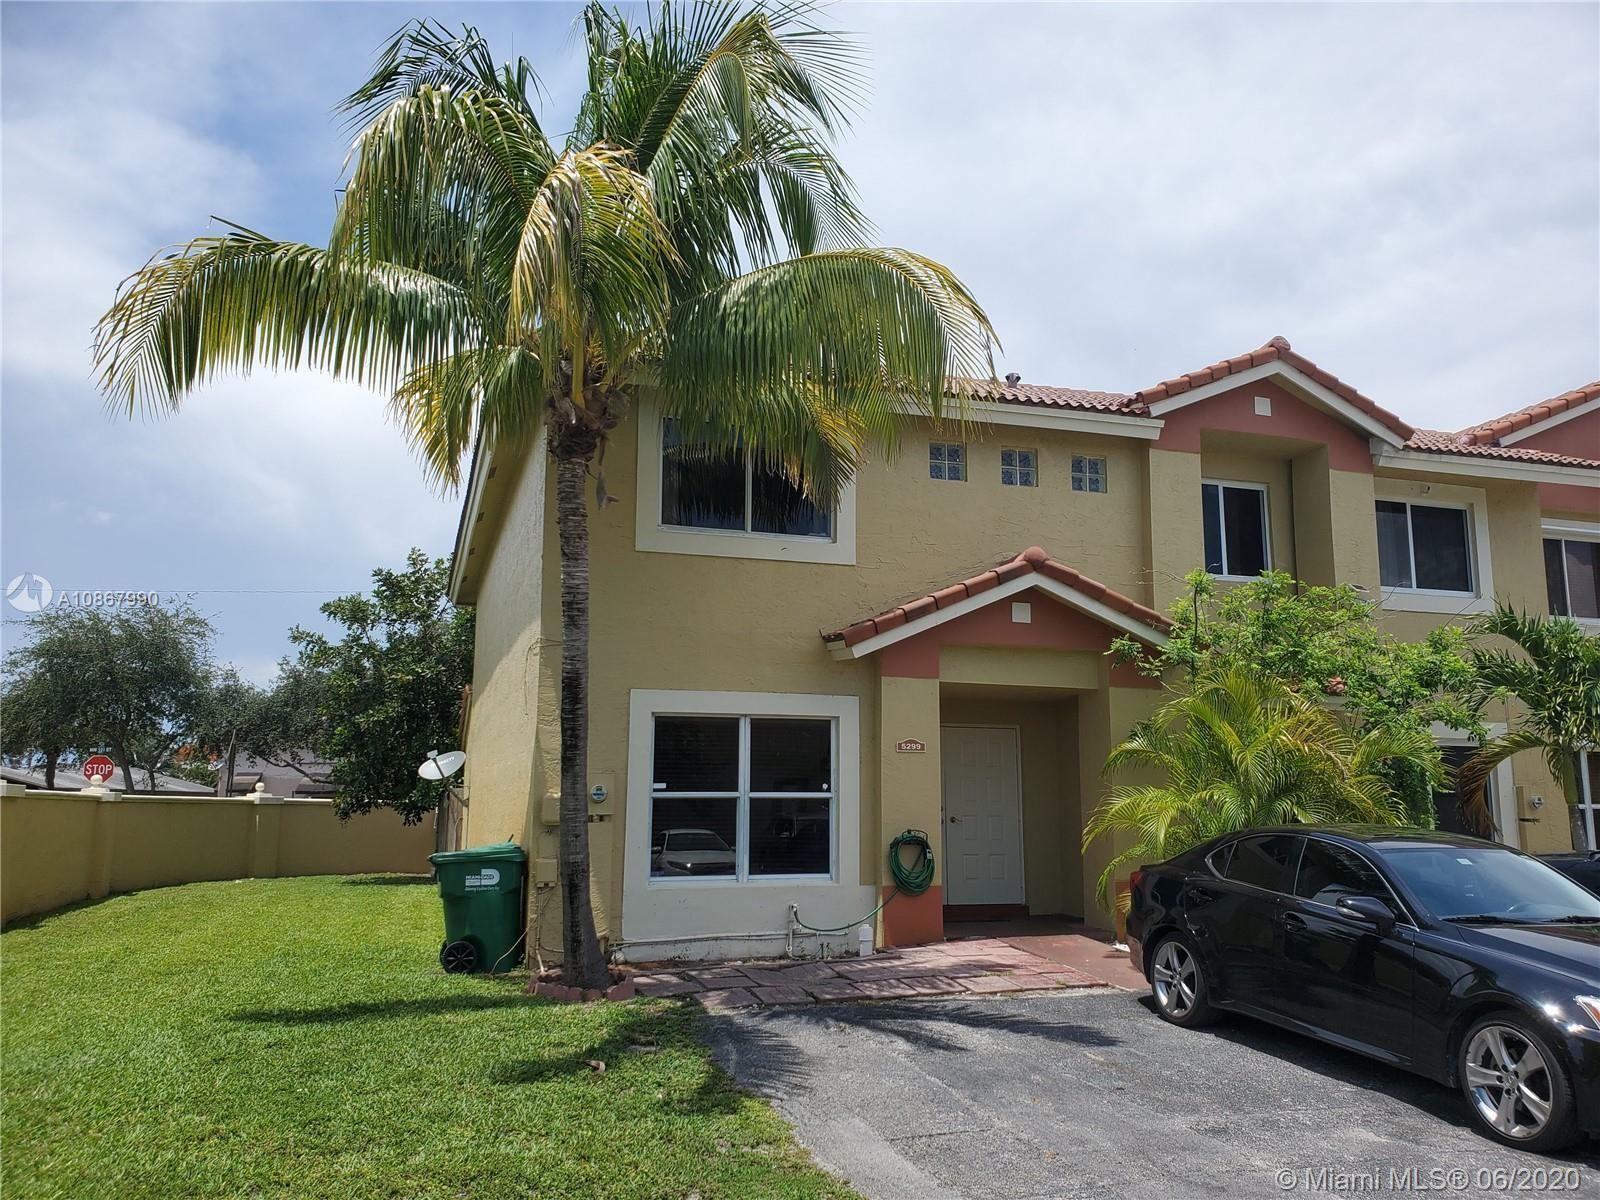 5299 NW 190th Ln #., Miami Gardens, FL 33055 - #: A10867990